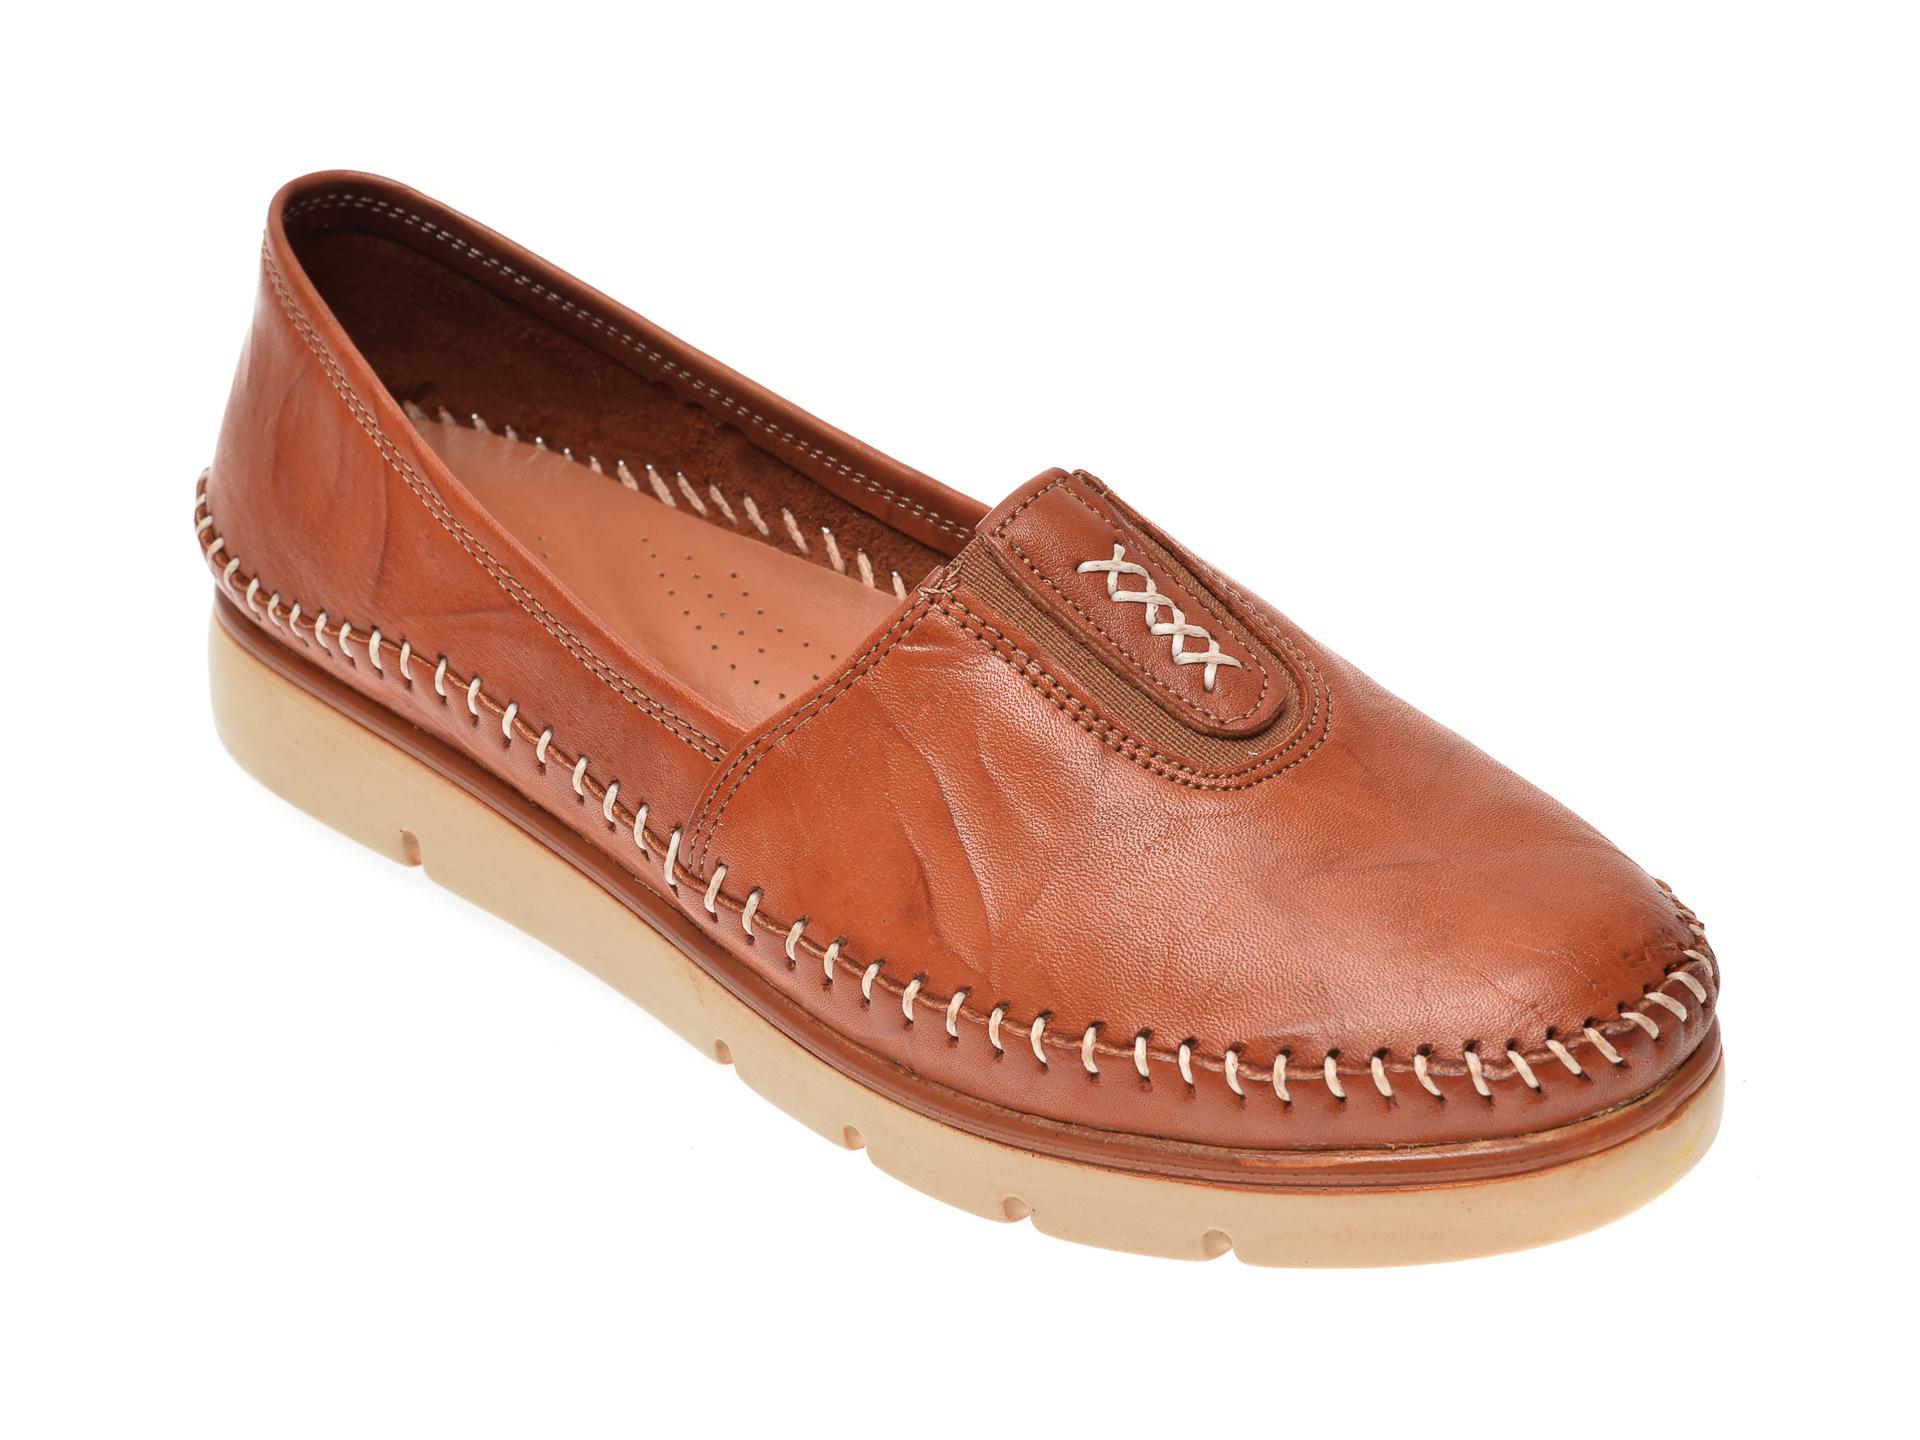 Pantofi FLAVIA PASSINI maro, 1712, din piele naturala